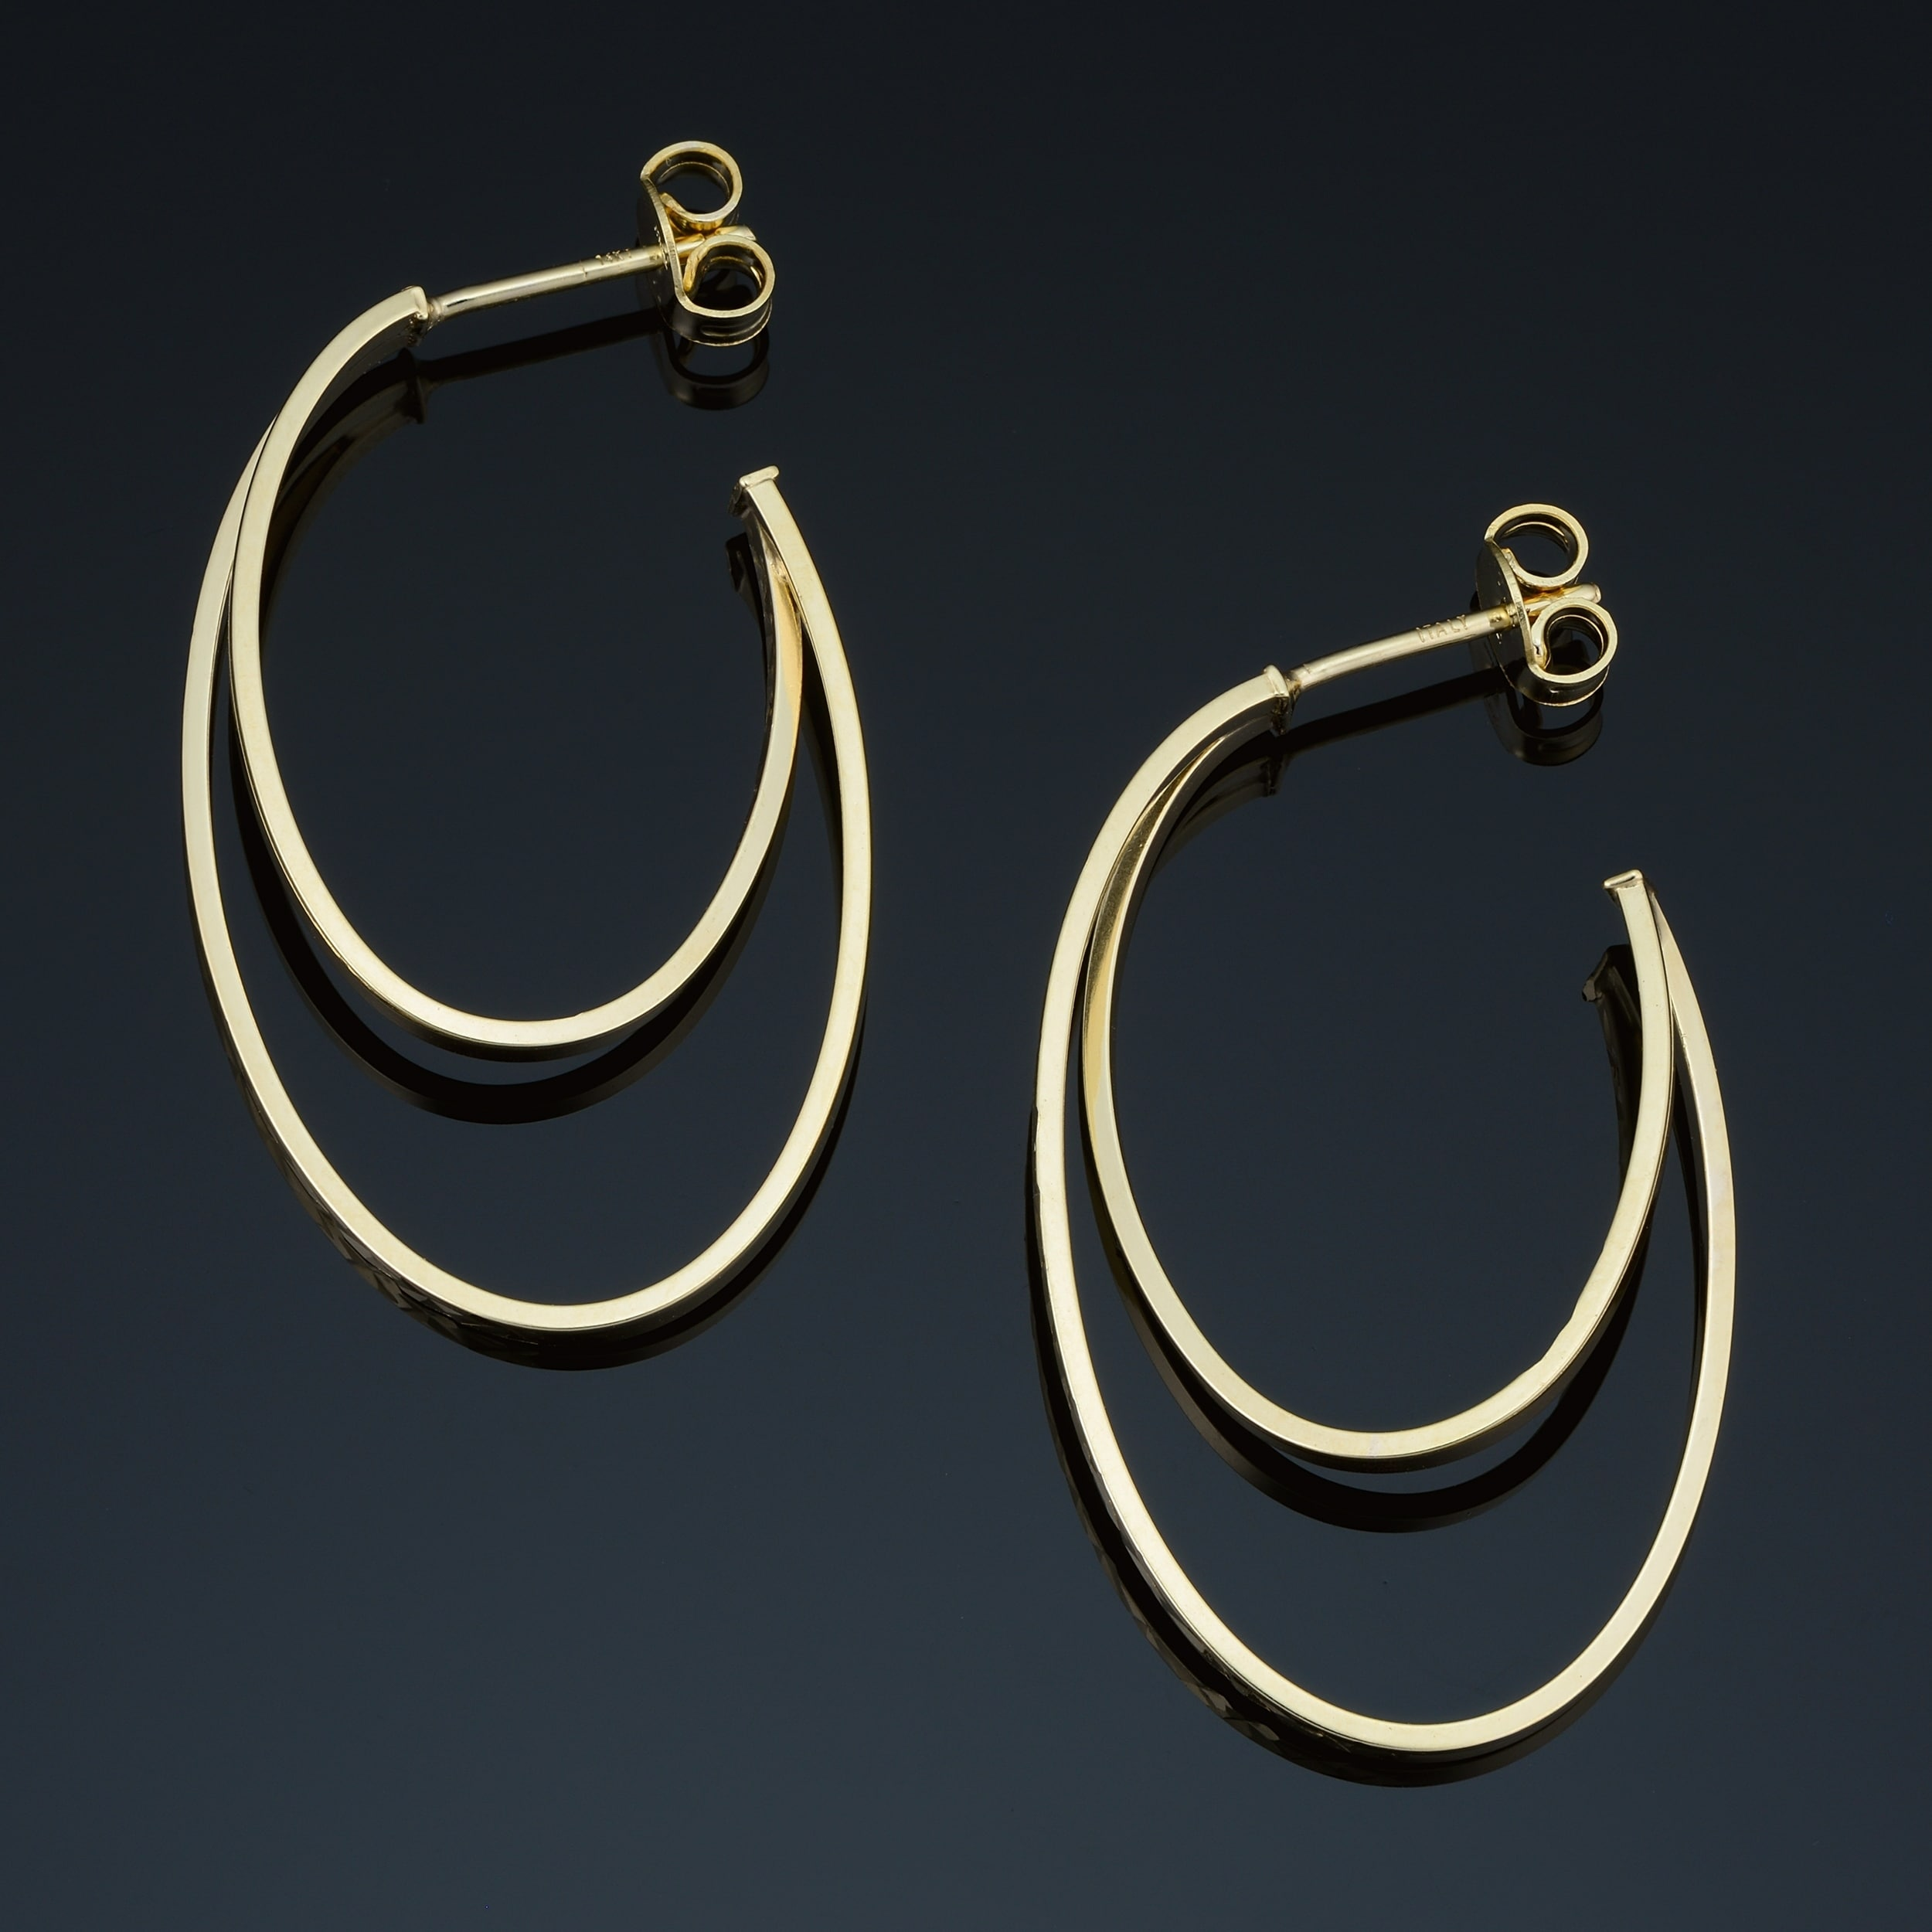 14k Yellow Gold Eye-Catching Graduated Oval Hoop Earrings